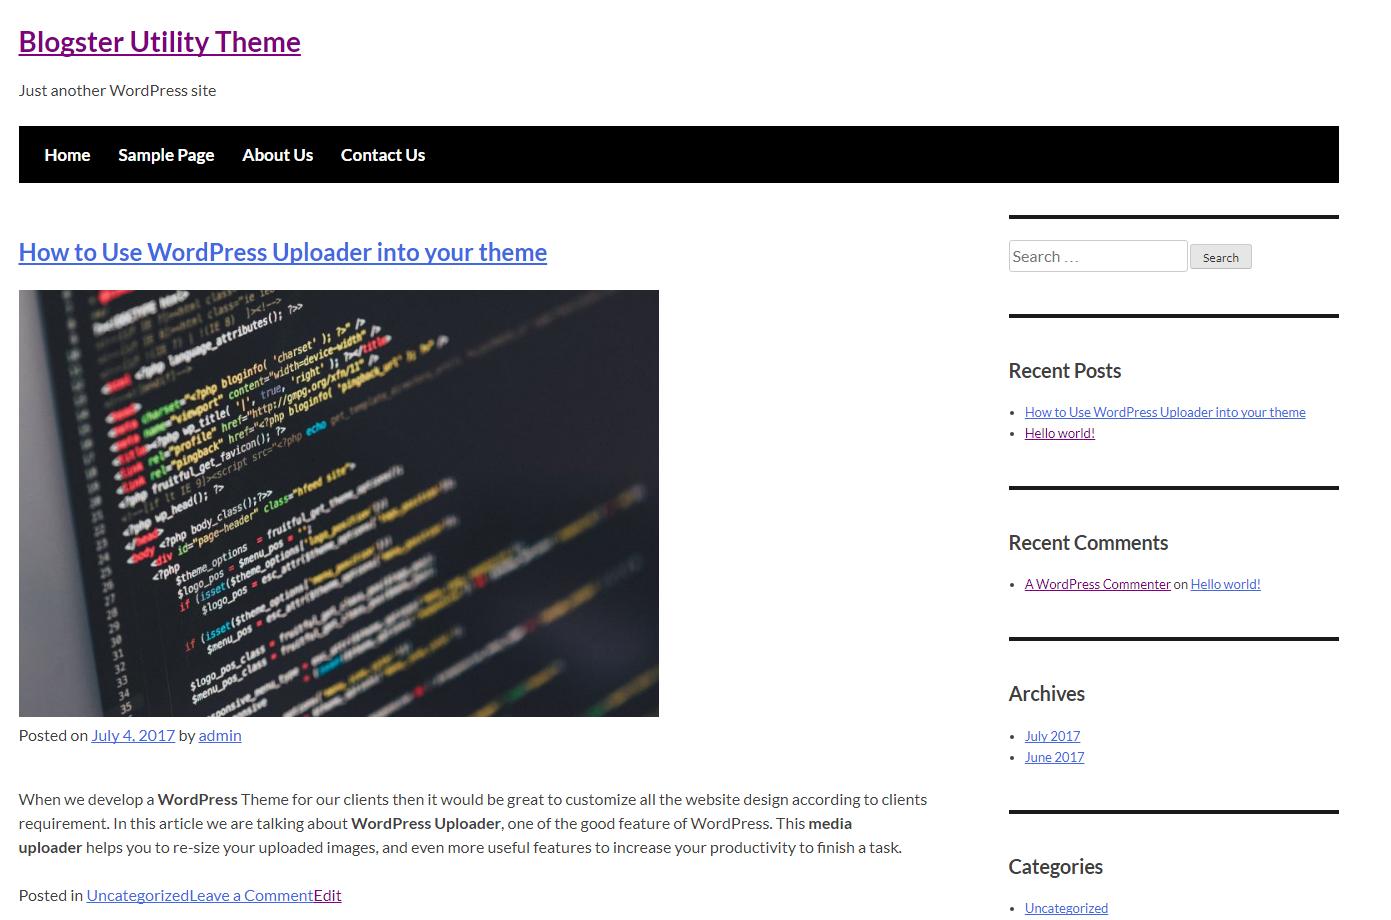 https://themes.svn.wordpress.org/blogster-utility/1.0.5/screenshot.png